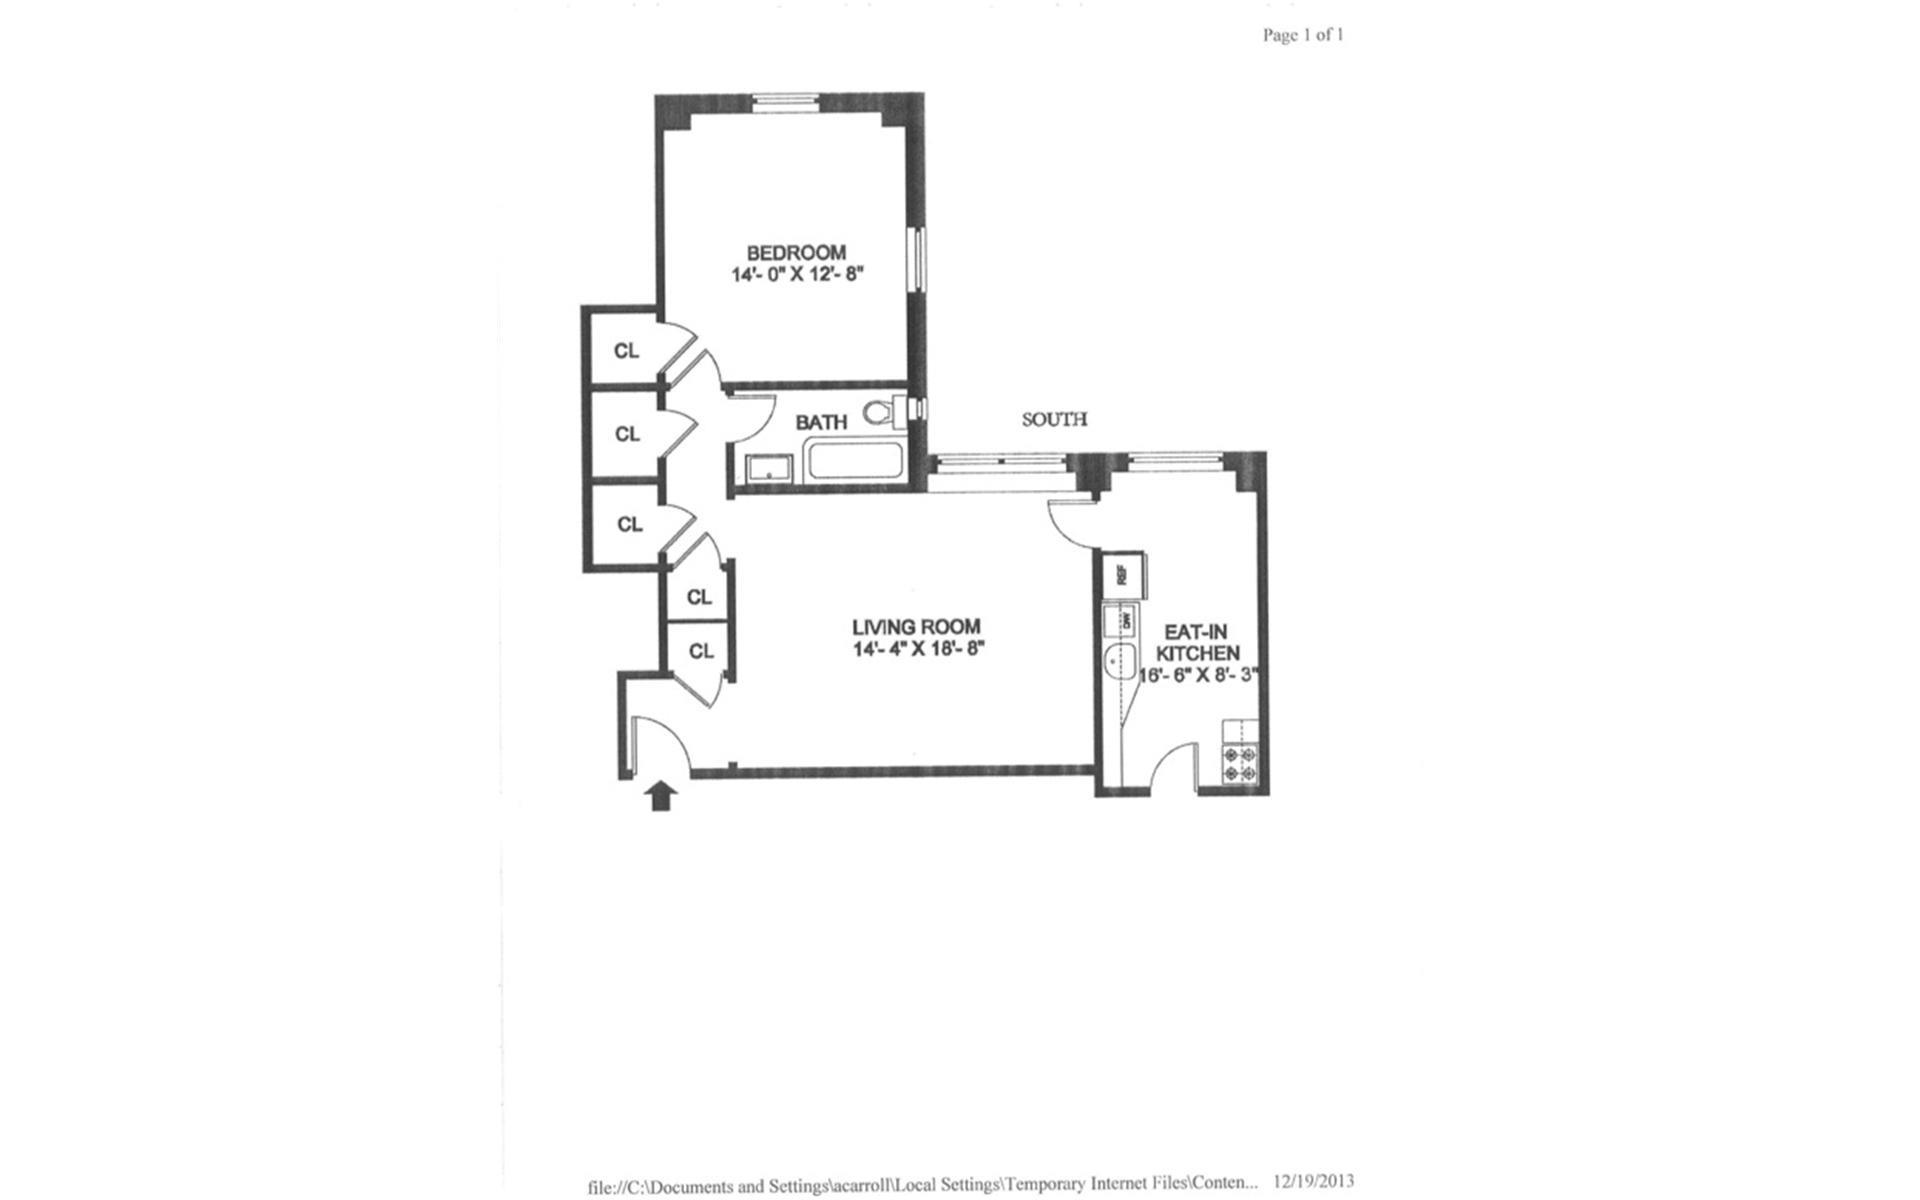 Floor plan of 395 Riverside Drive, 2D - Upper West Side, New York